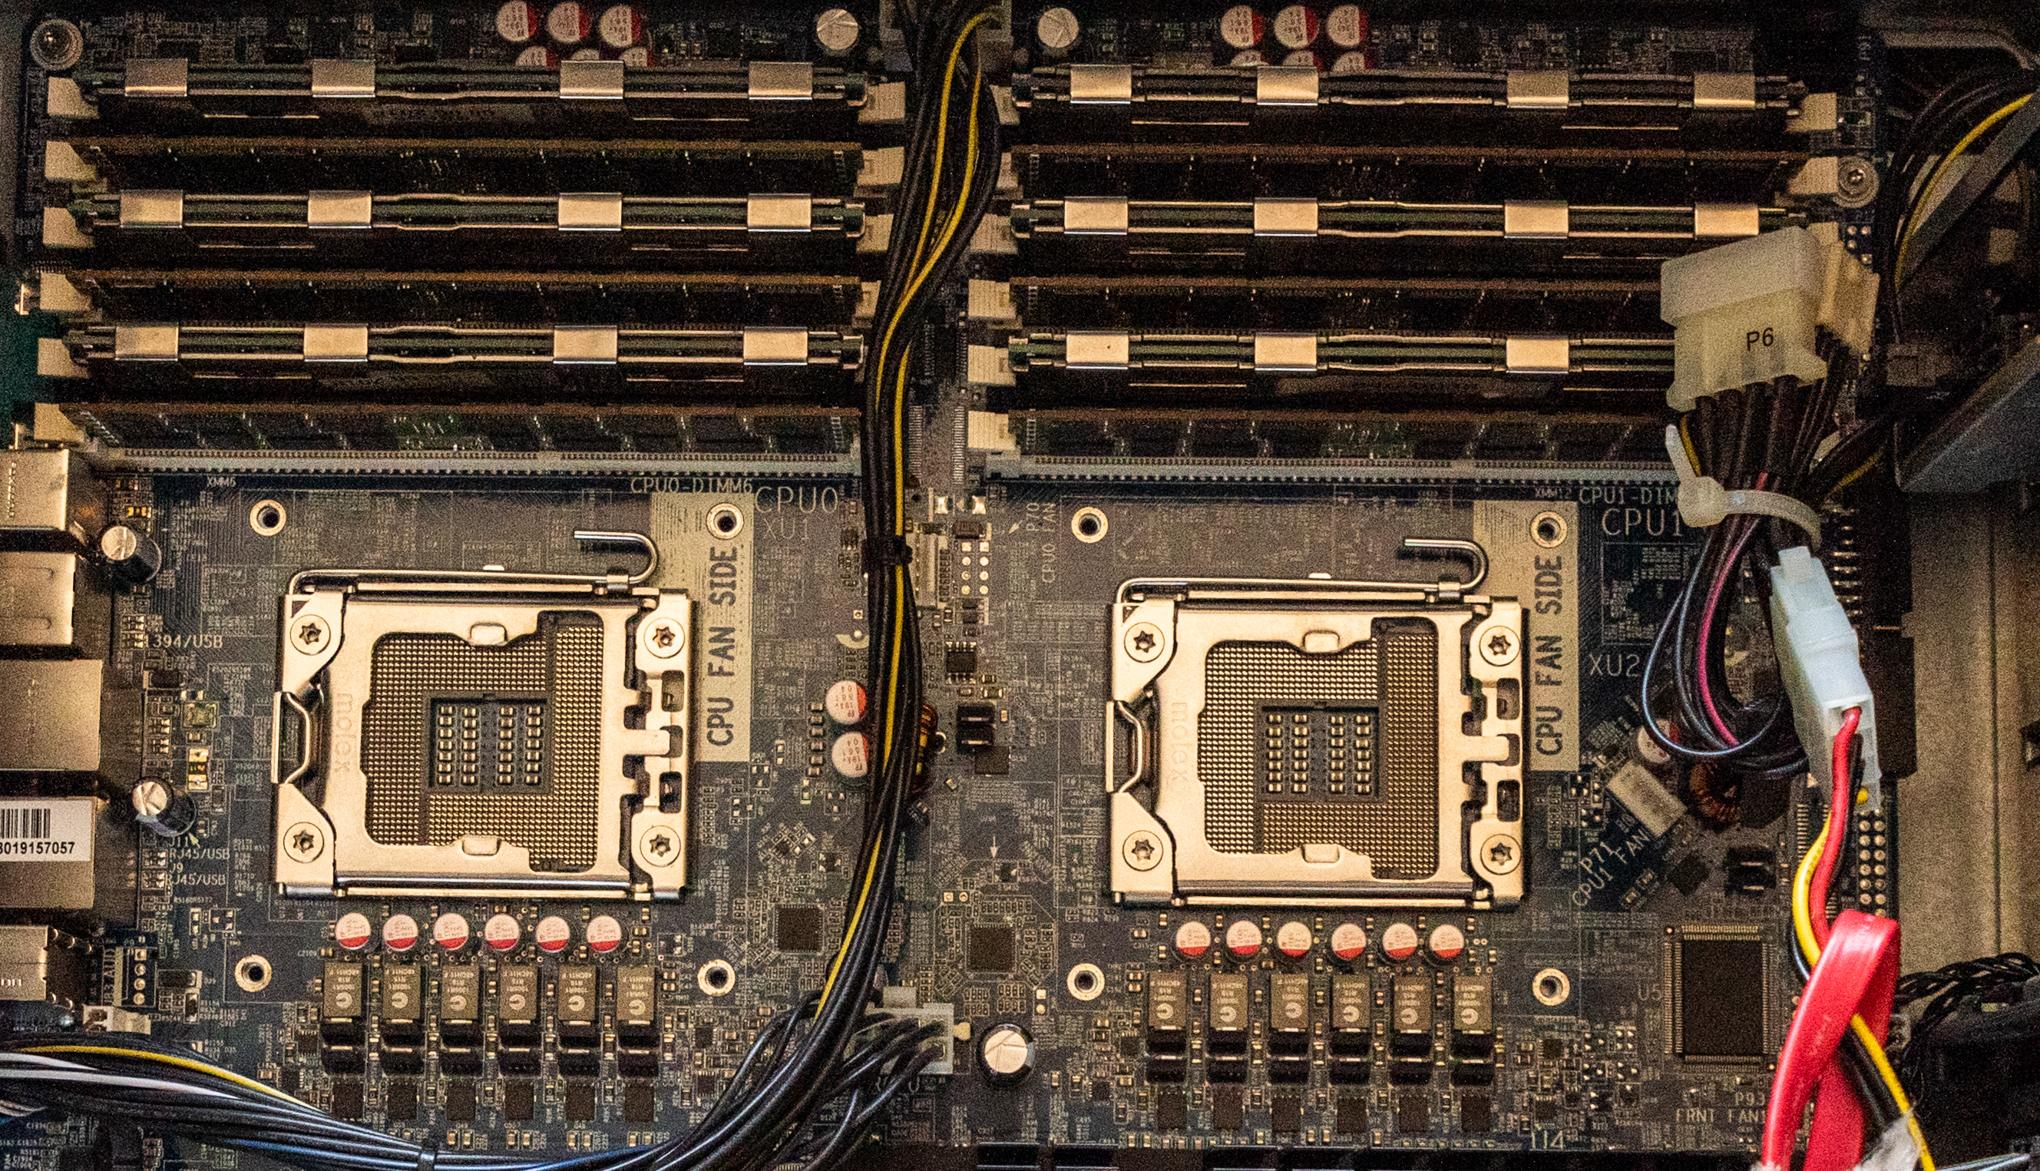 Z800 empty CPU slots